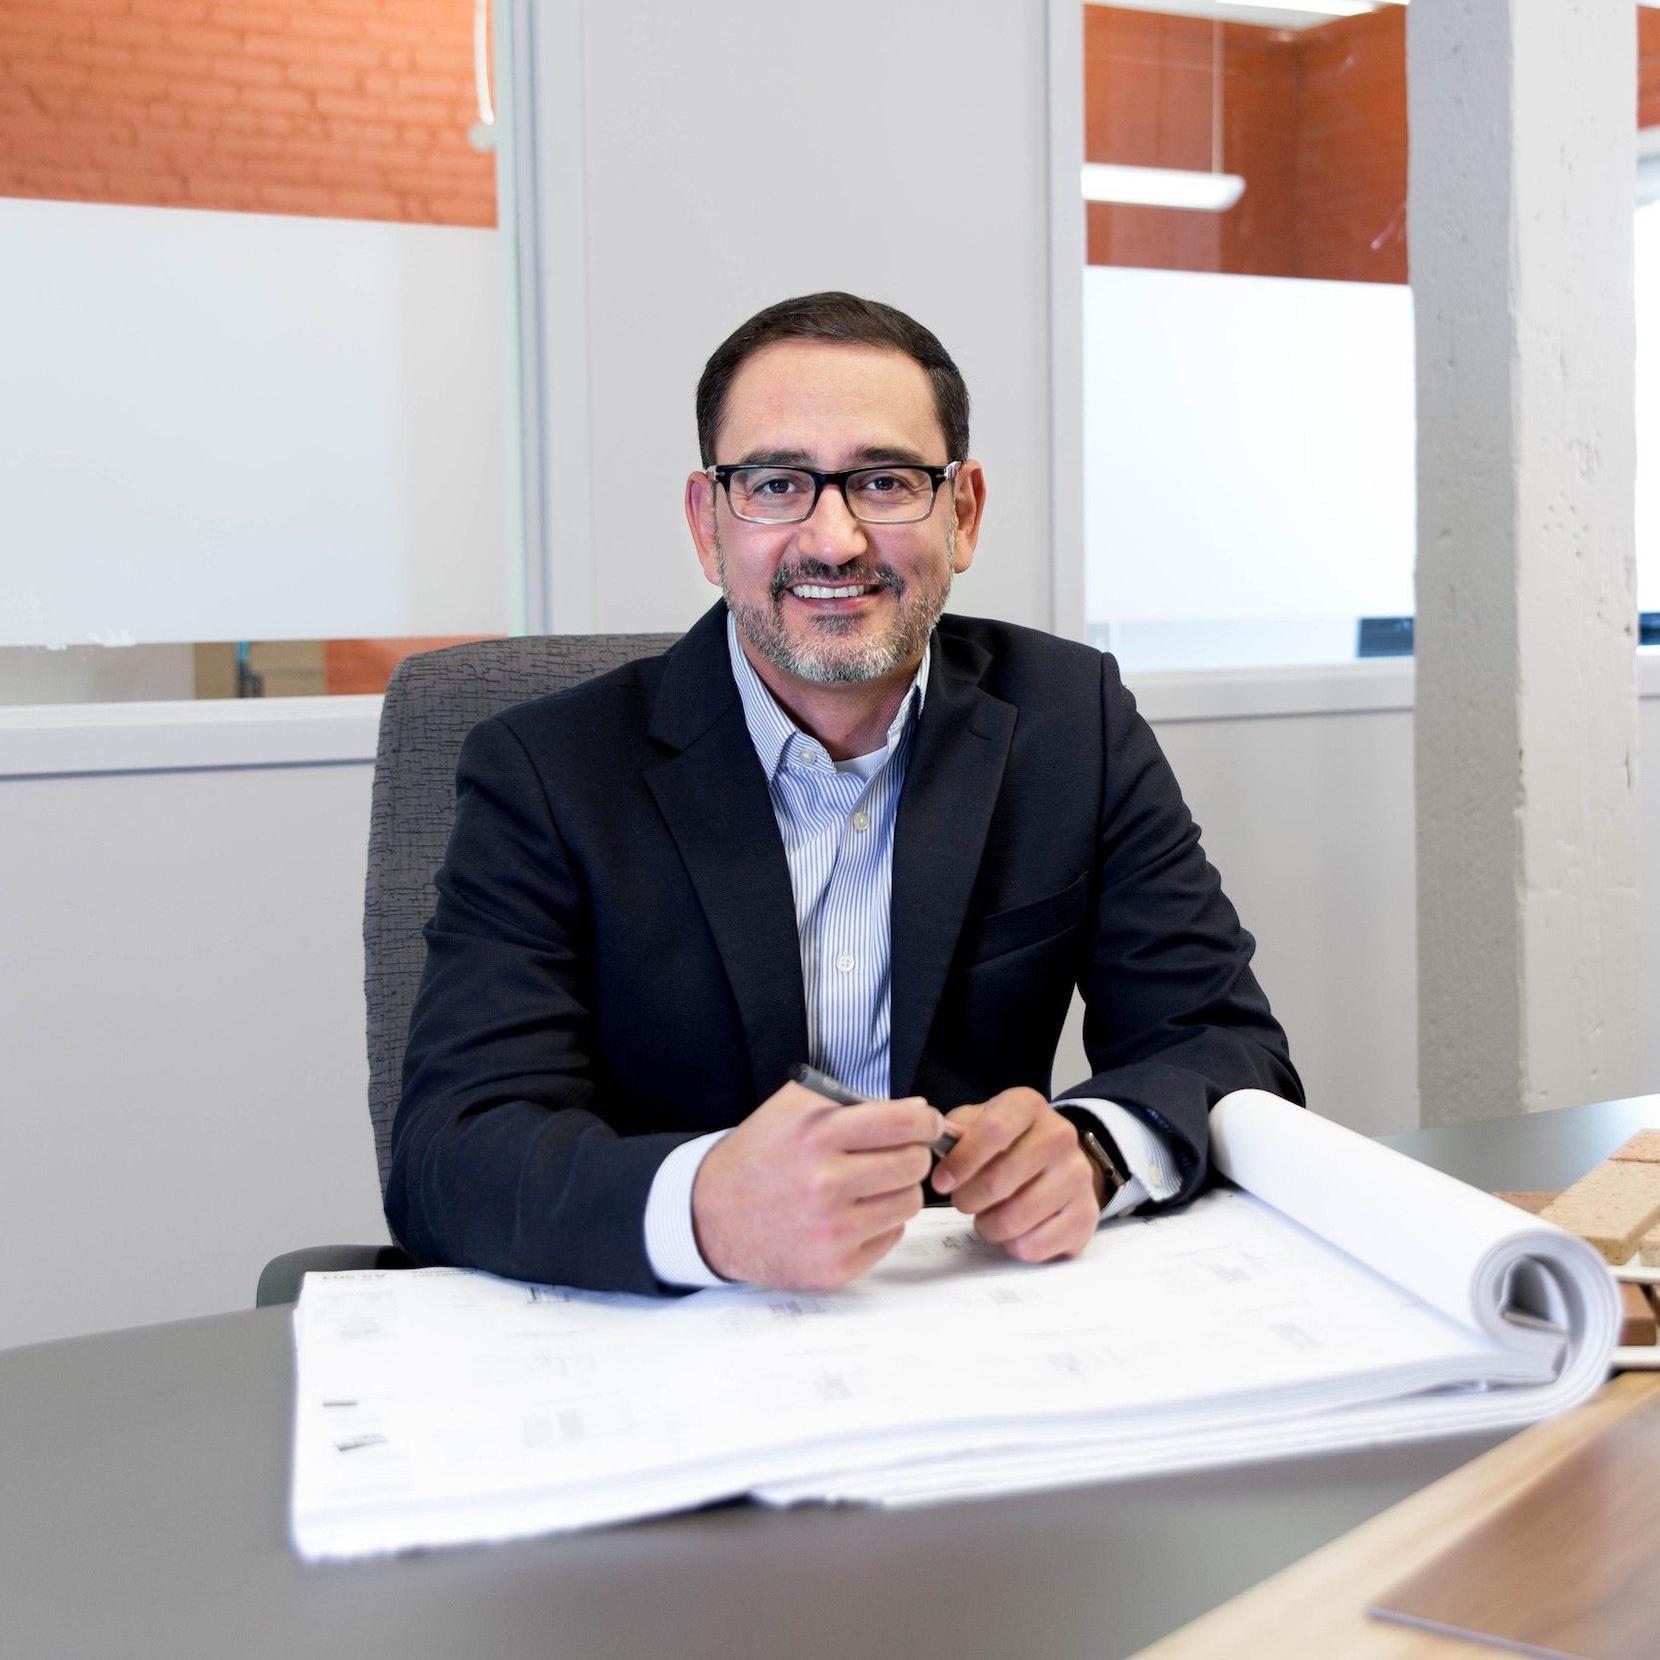 Job Gutierrez